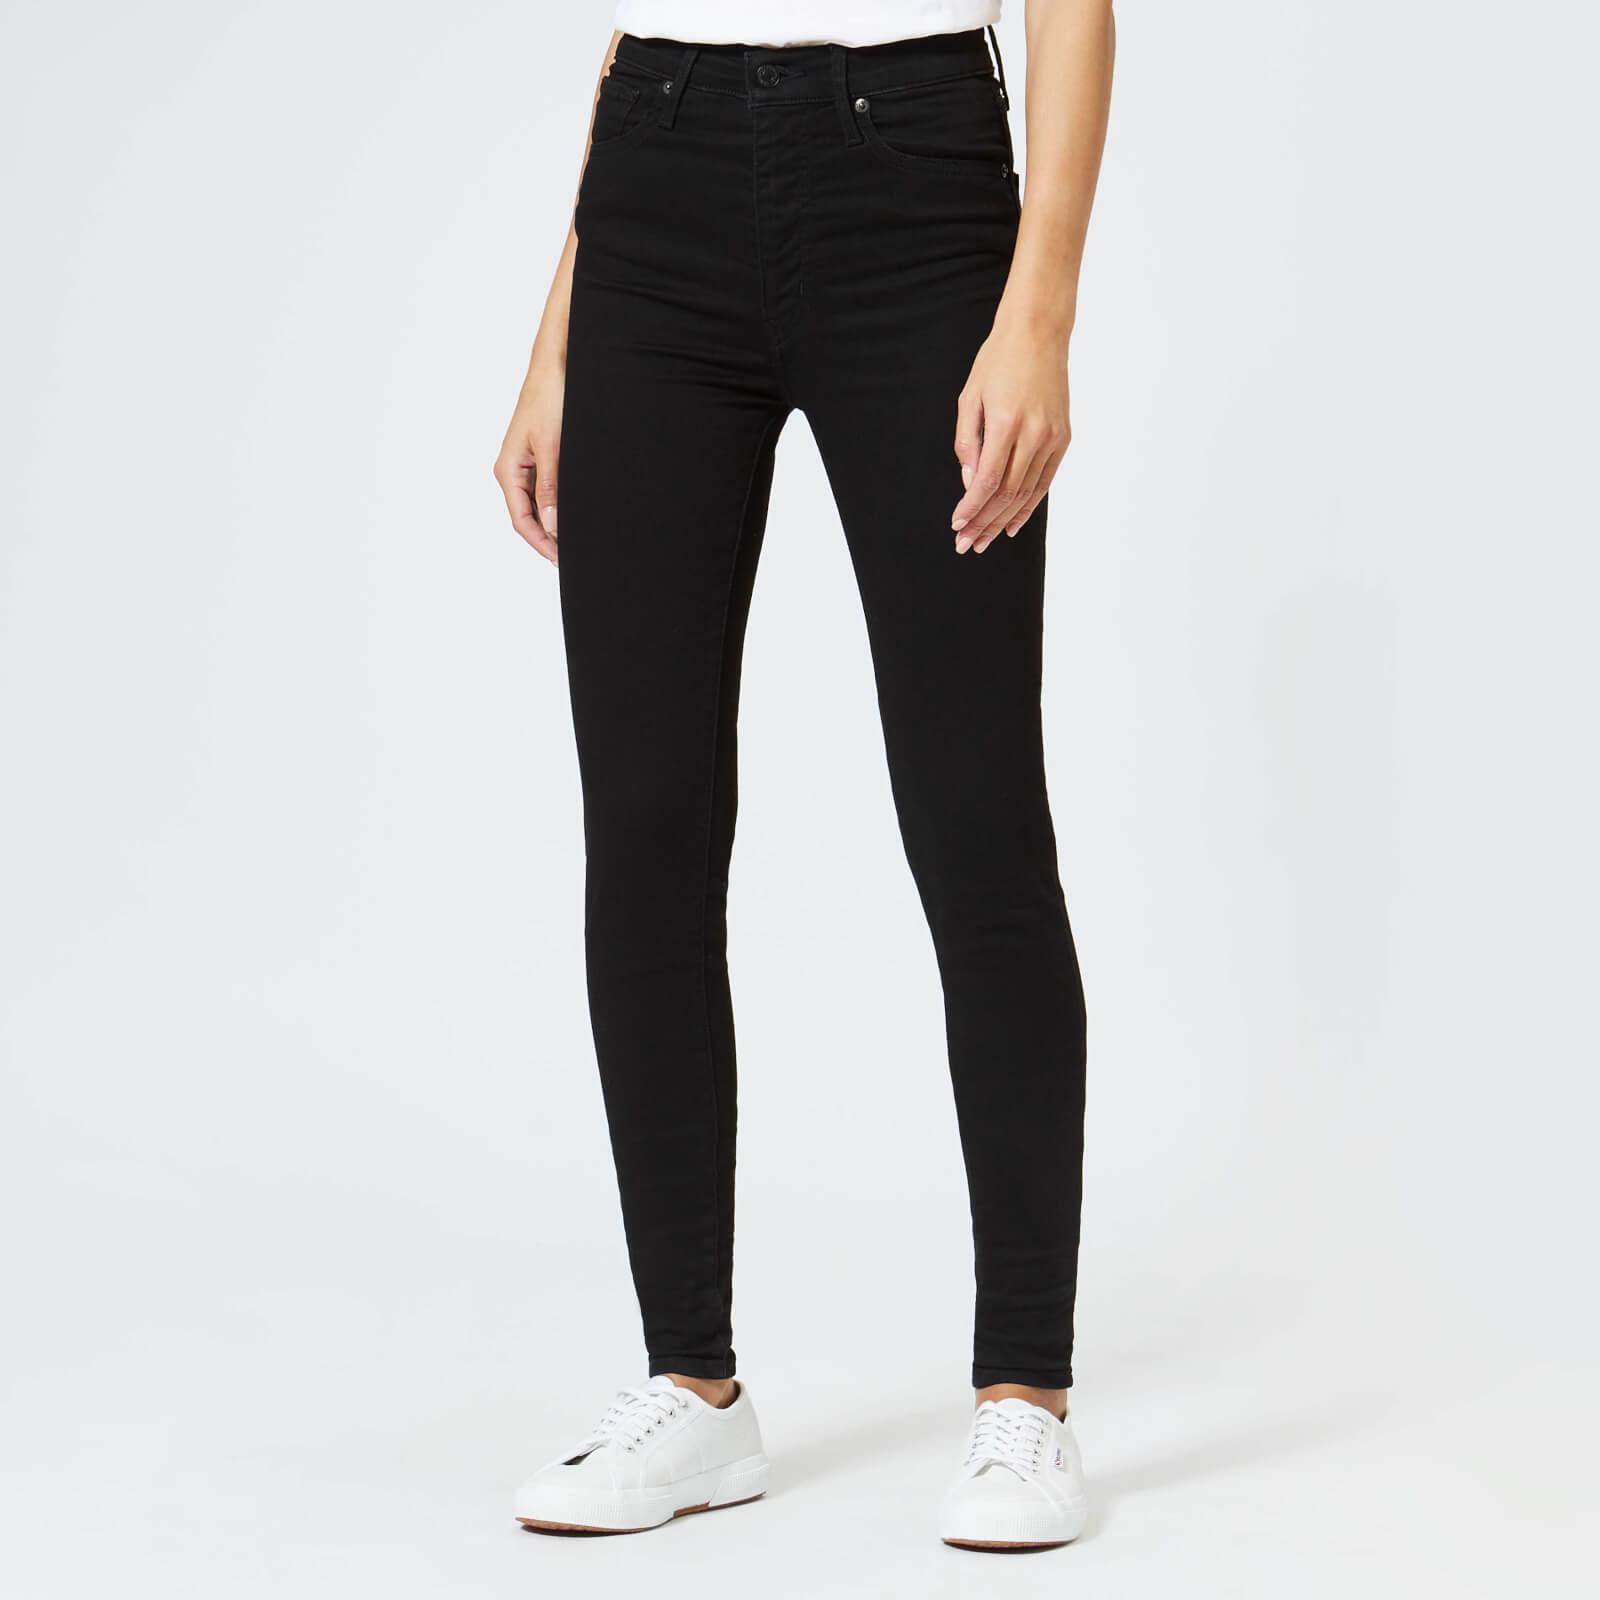 Levi's s Mile High Super Skinny Jeans - Black Galaxy - W29/L32